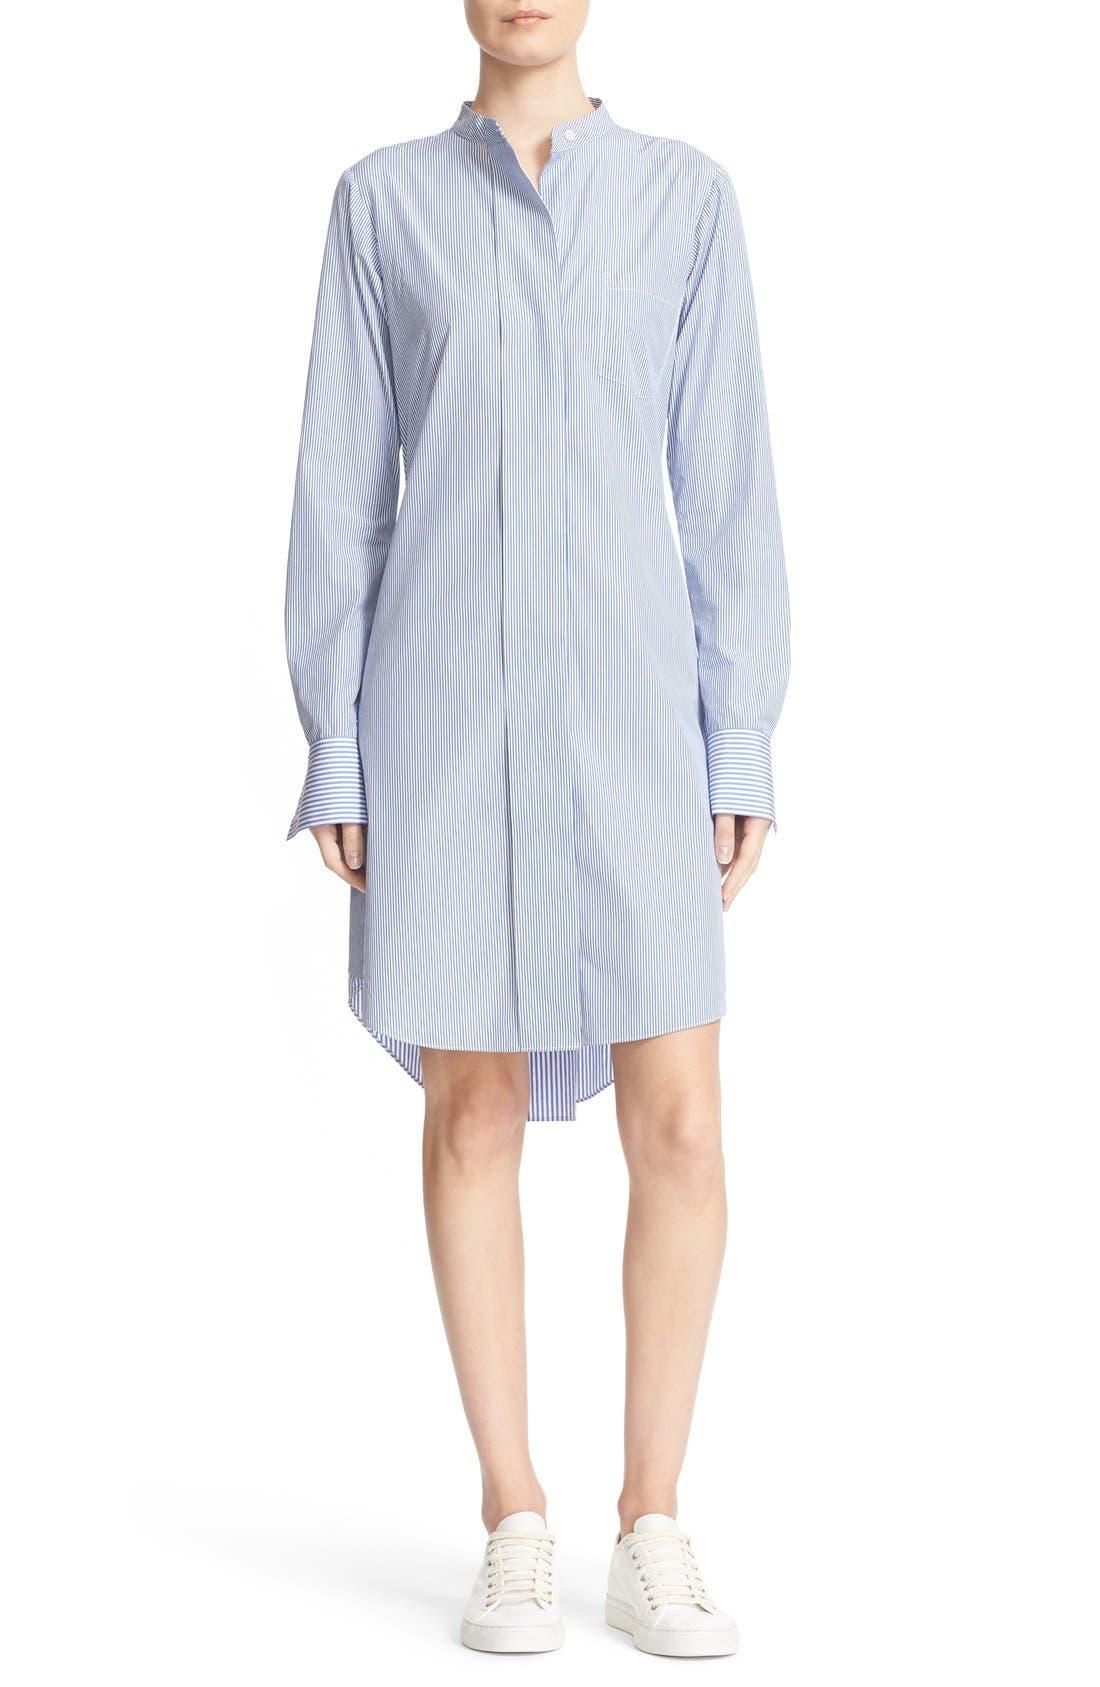 Alternate Image 1 Selected - Theory Jodalee Cotton Poplin Shirtdress